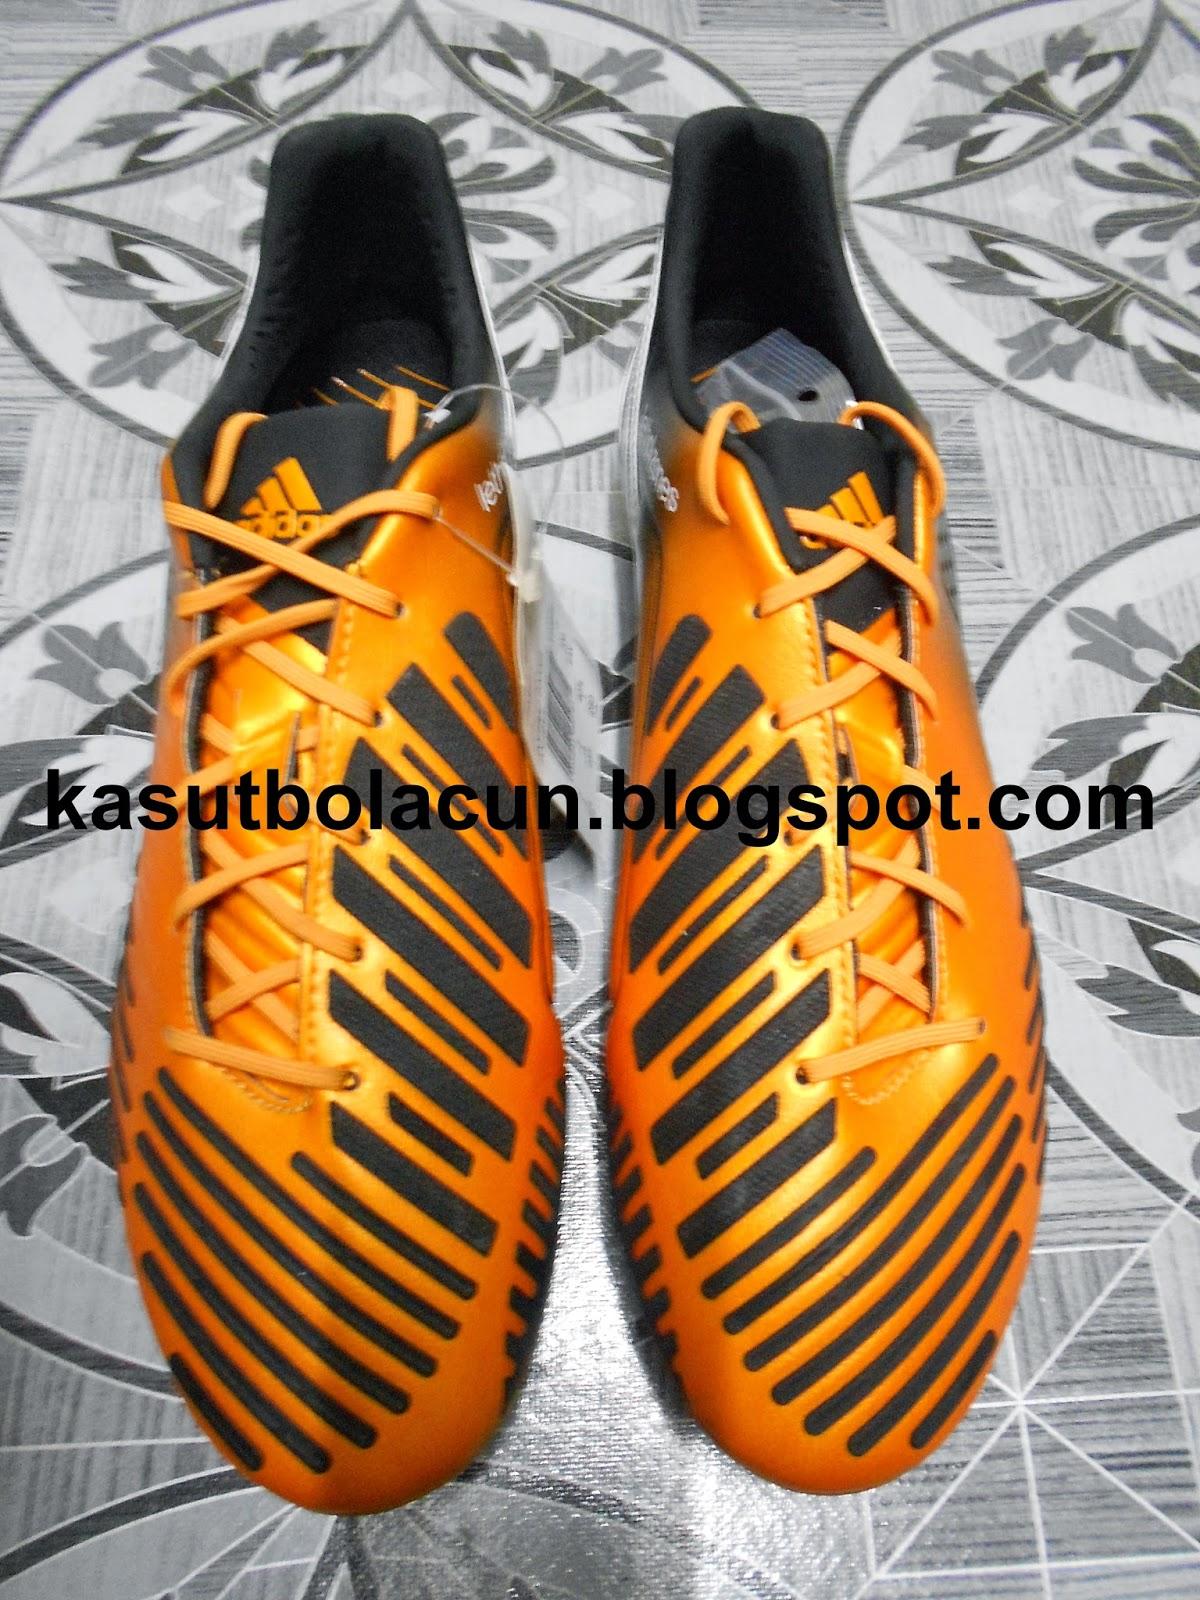 http://kasutbolacun.blogspot.com/2014/11/adidas-predator-lz-1-fg.html